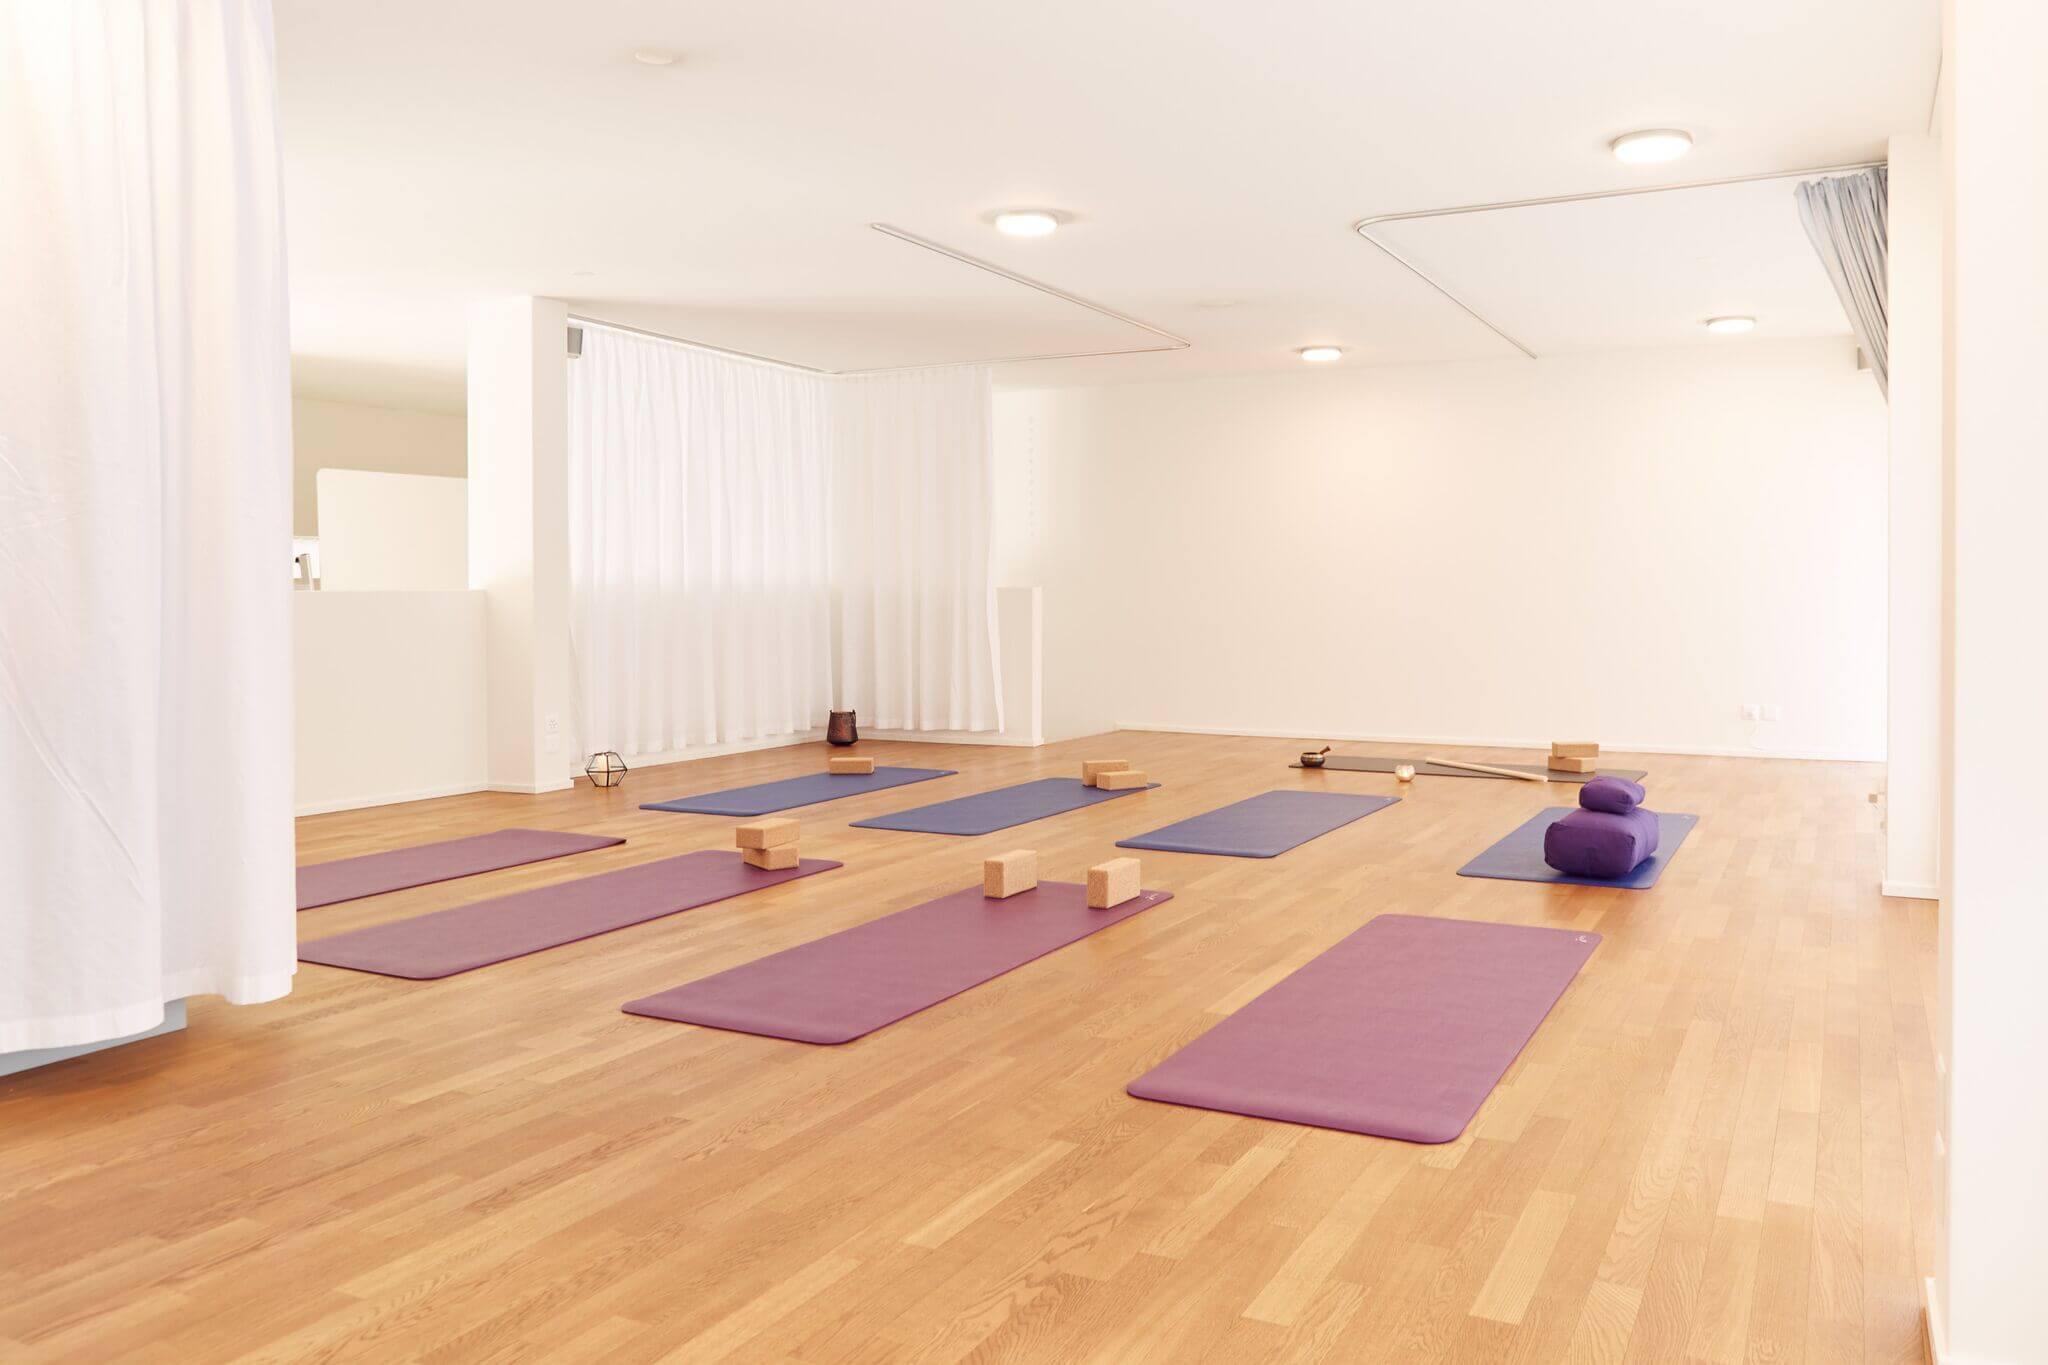 Bild vom Yogastudio im oberen Stockwerk